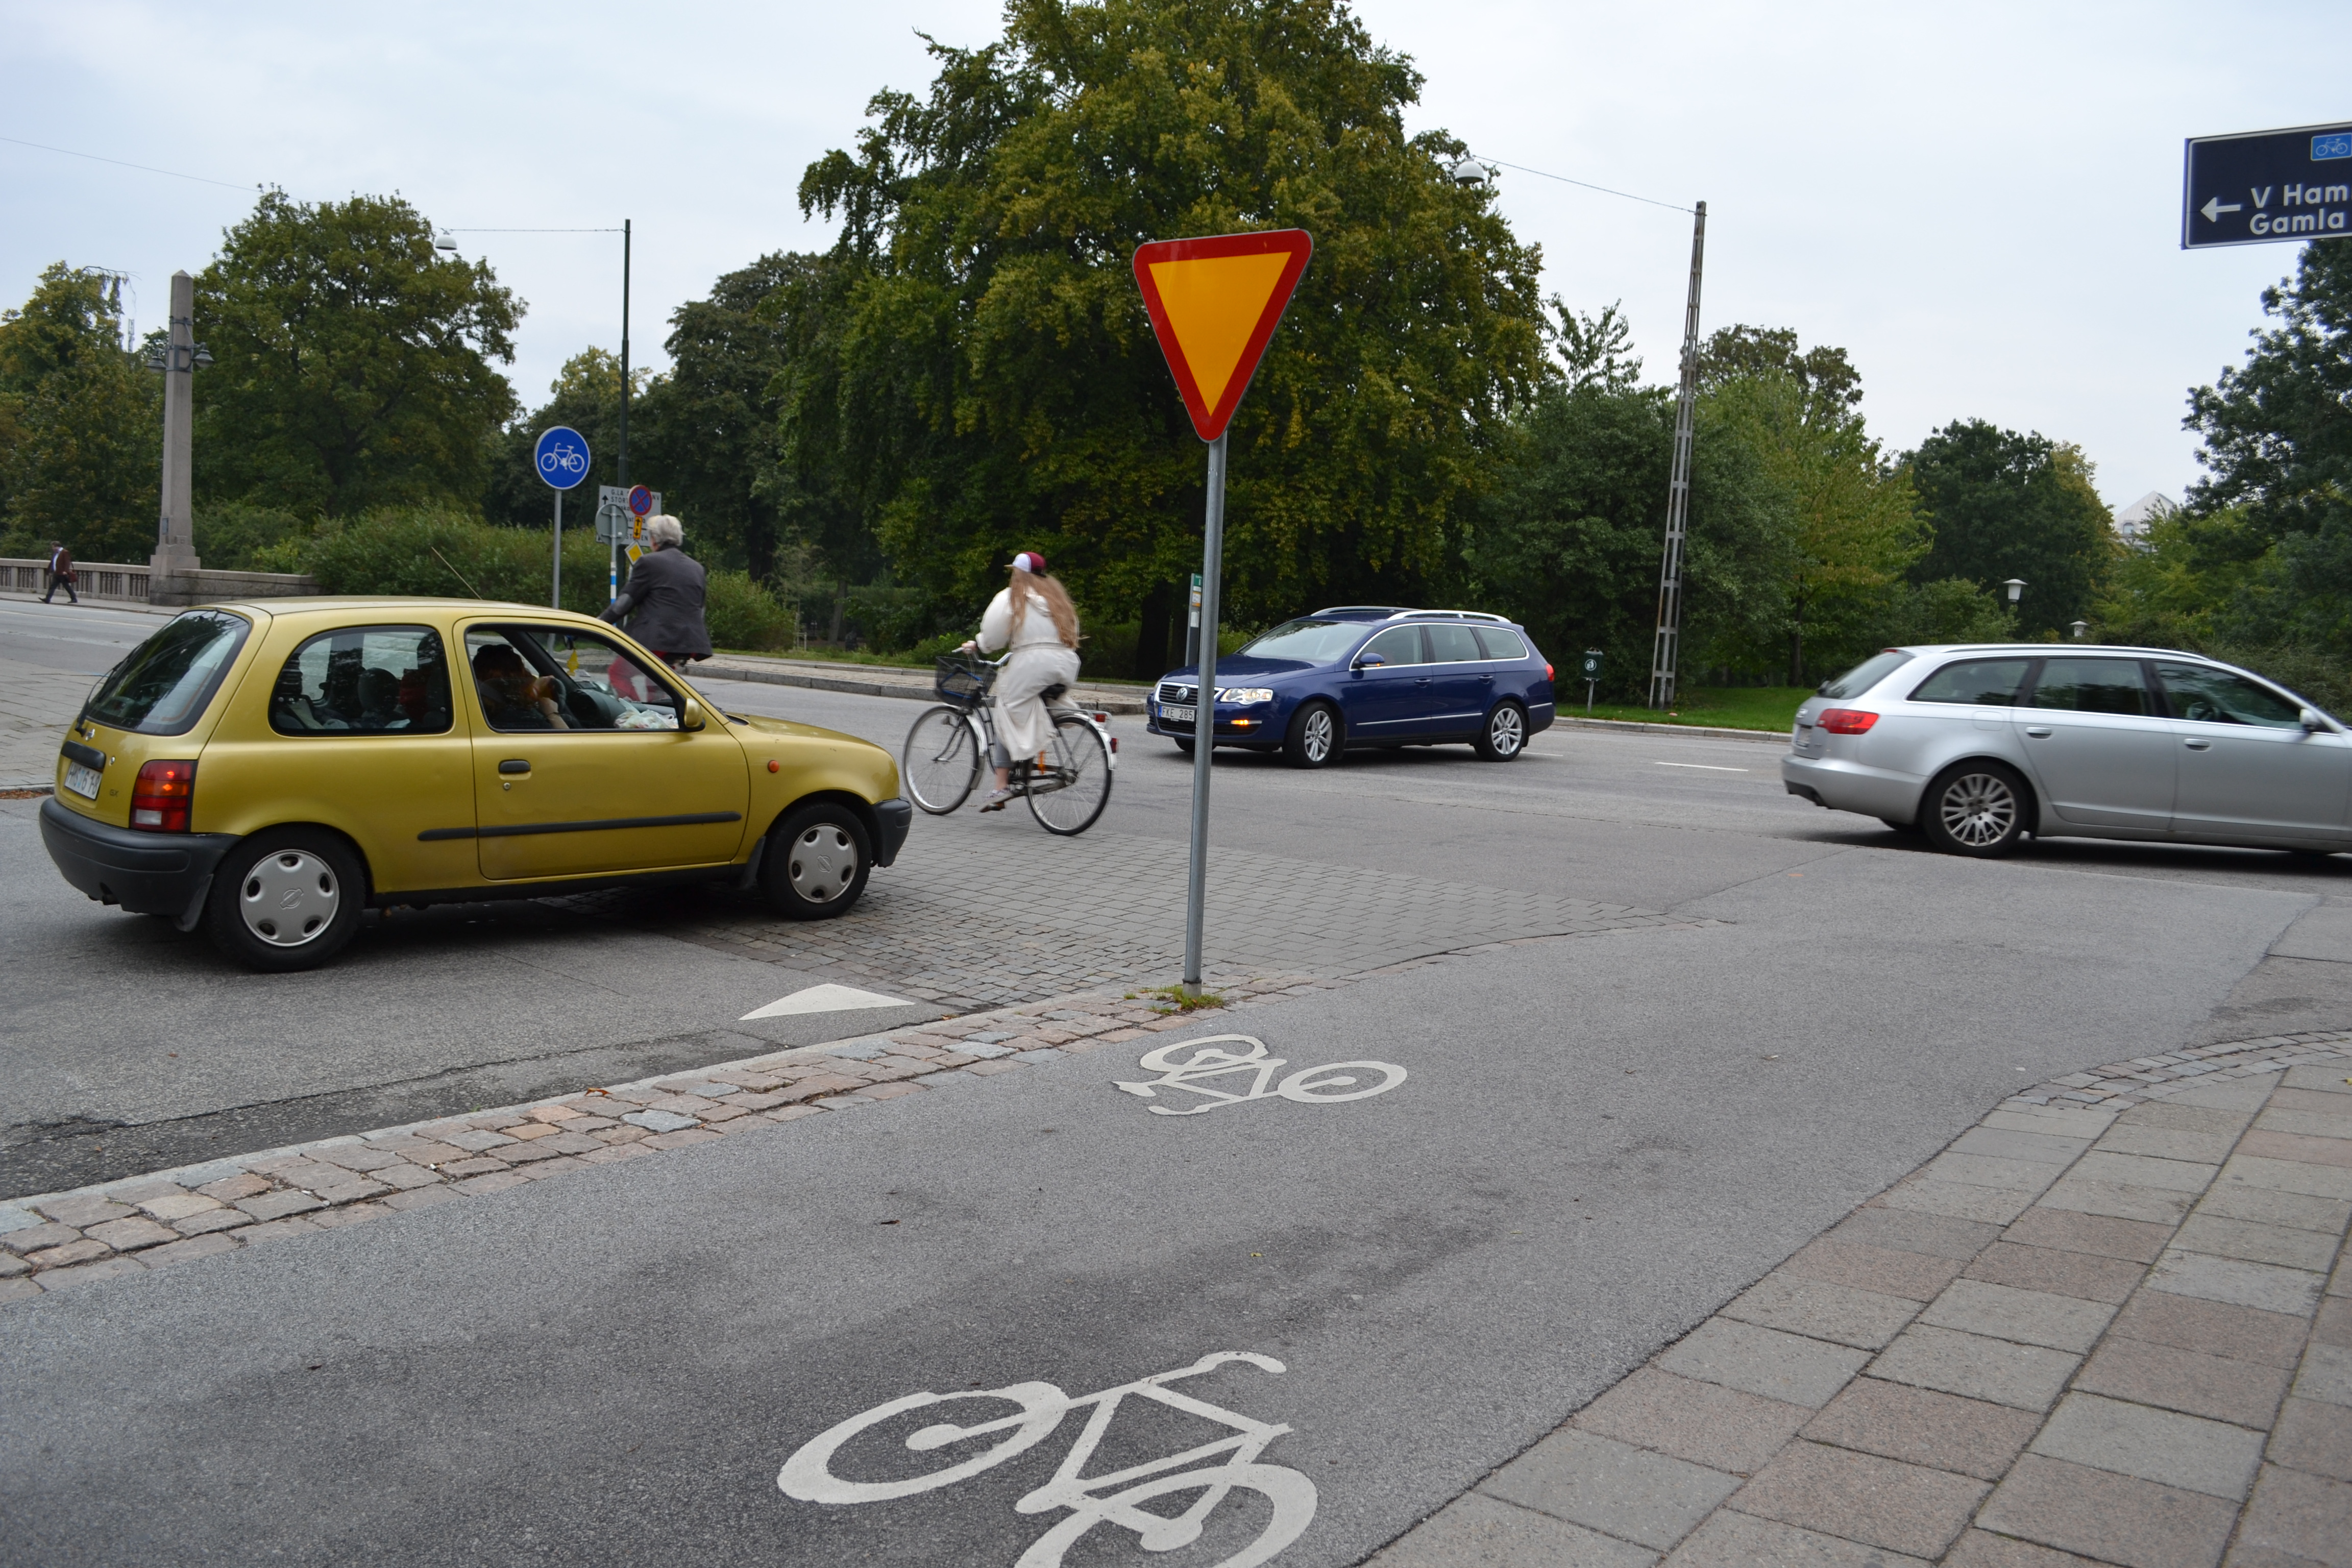 Obevakad cykelöverfart